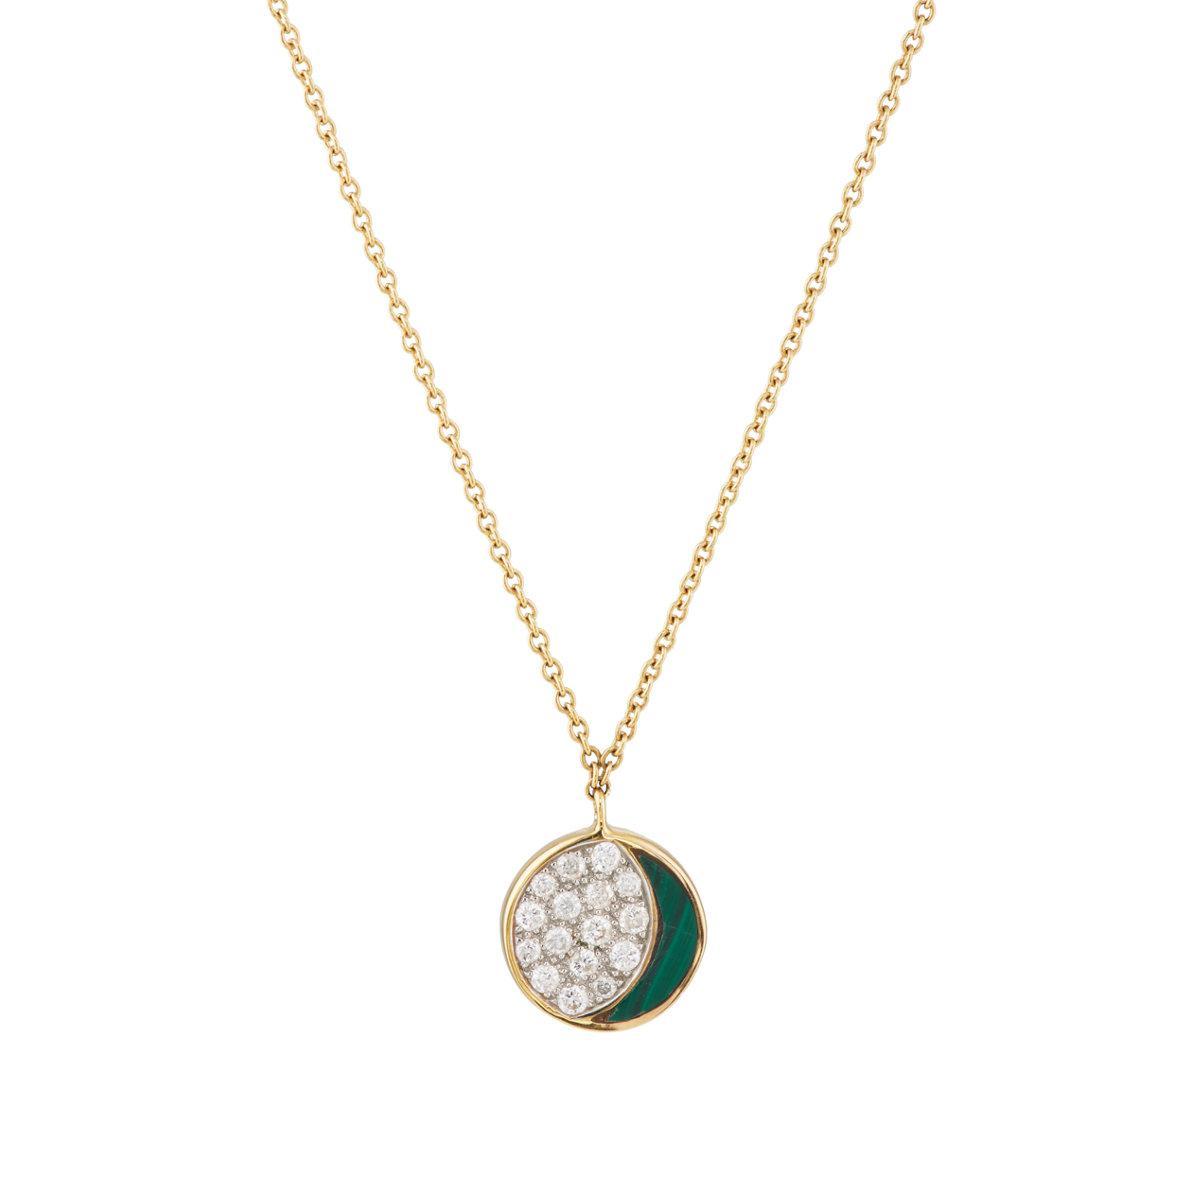 Womens Iris Pendant Necklace Pamela Love 9mlU6D6iD